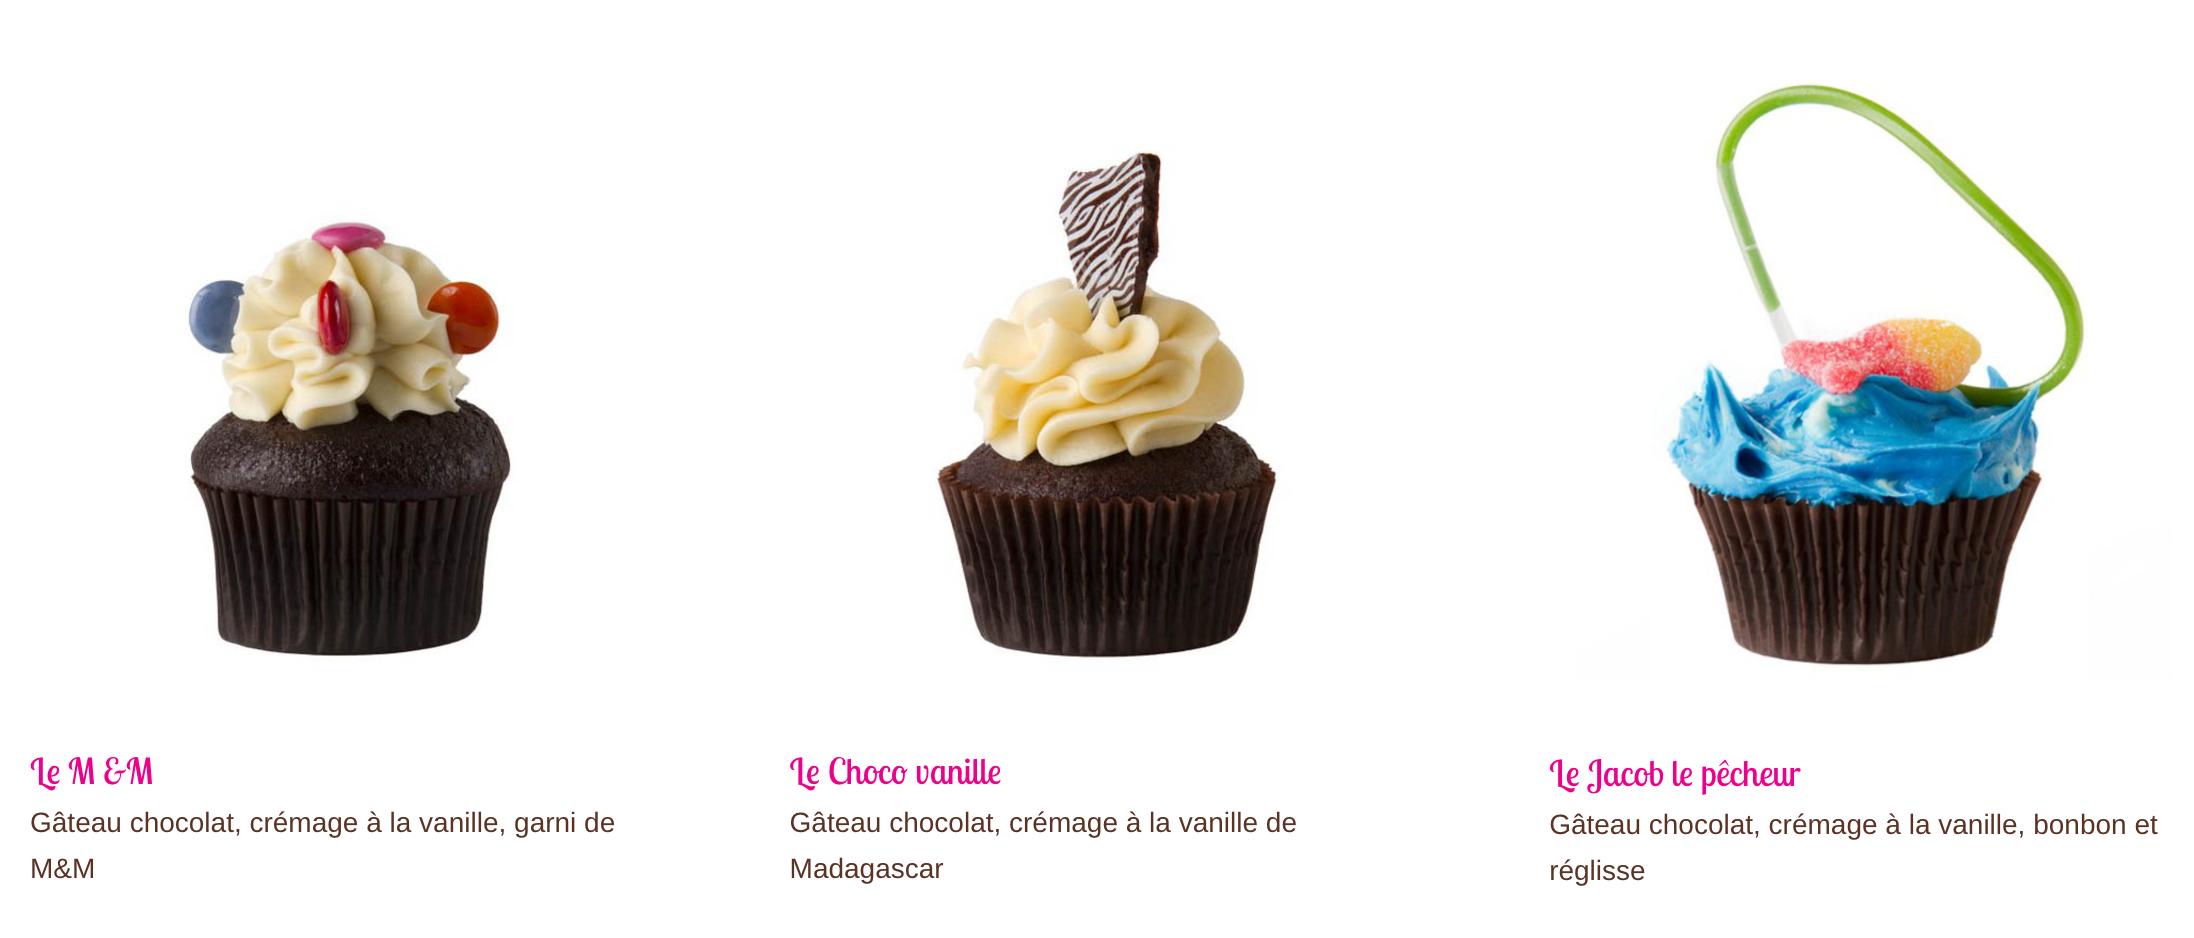 cupcake-coquelicto-smarties-chocolat-poisson-jujube-